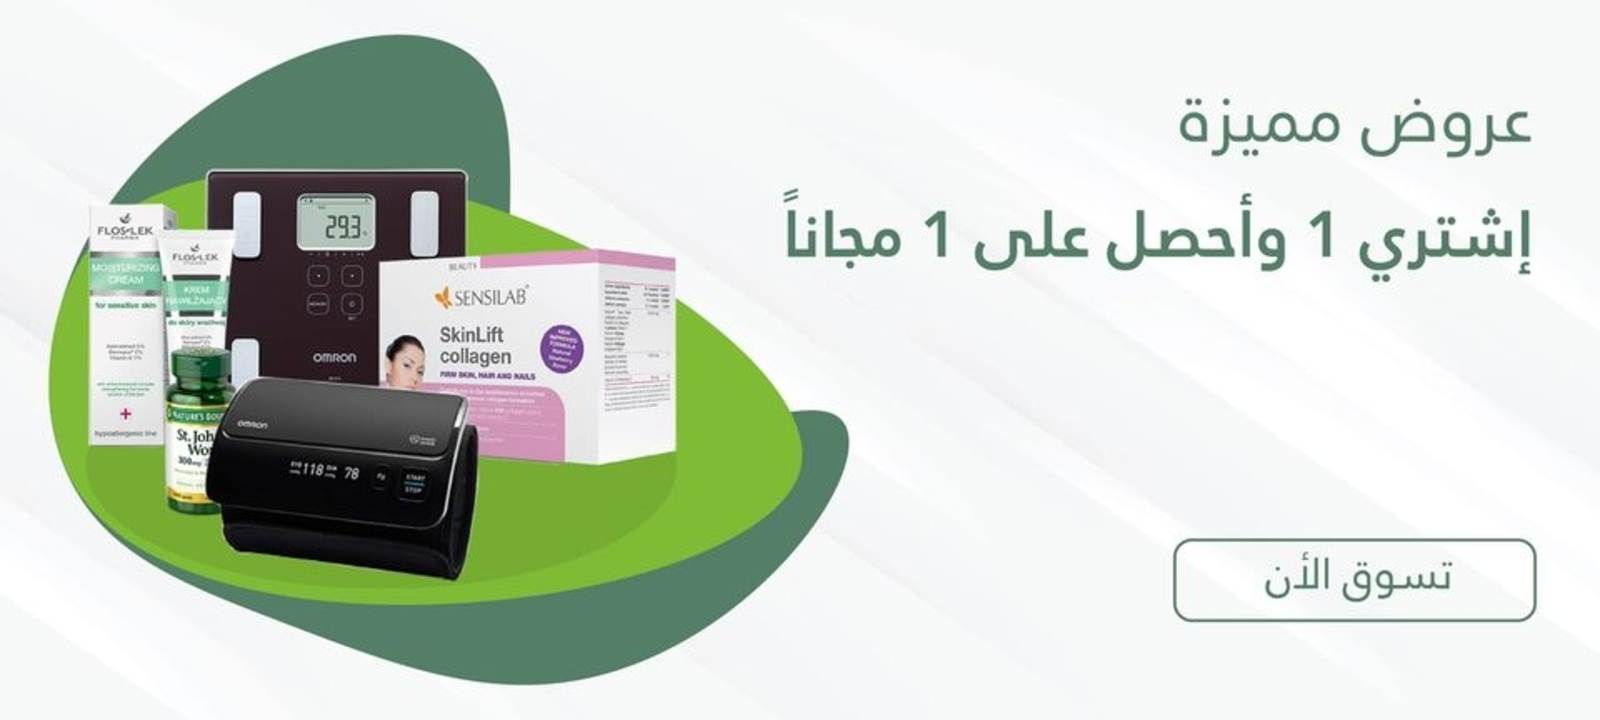 pharmatee-bunner (1)